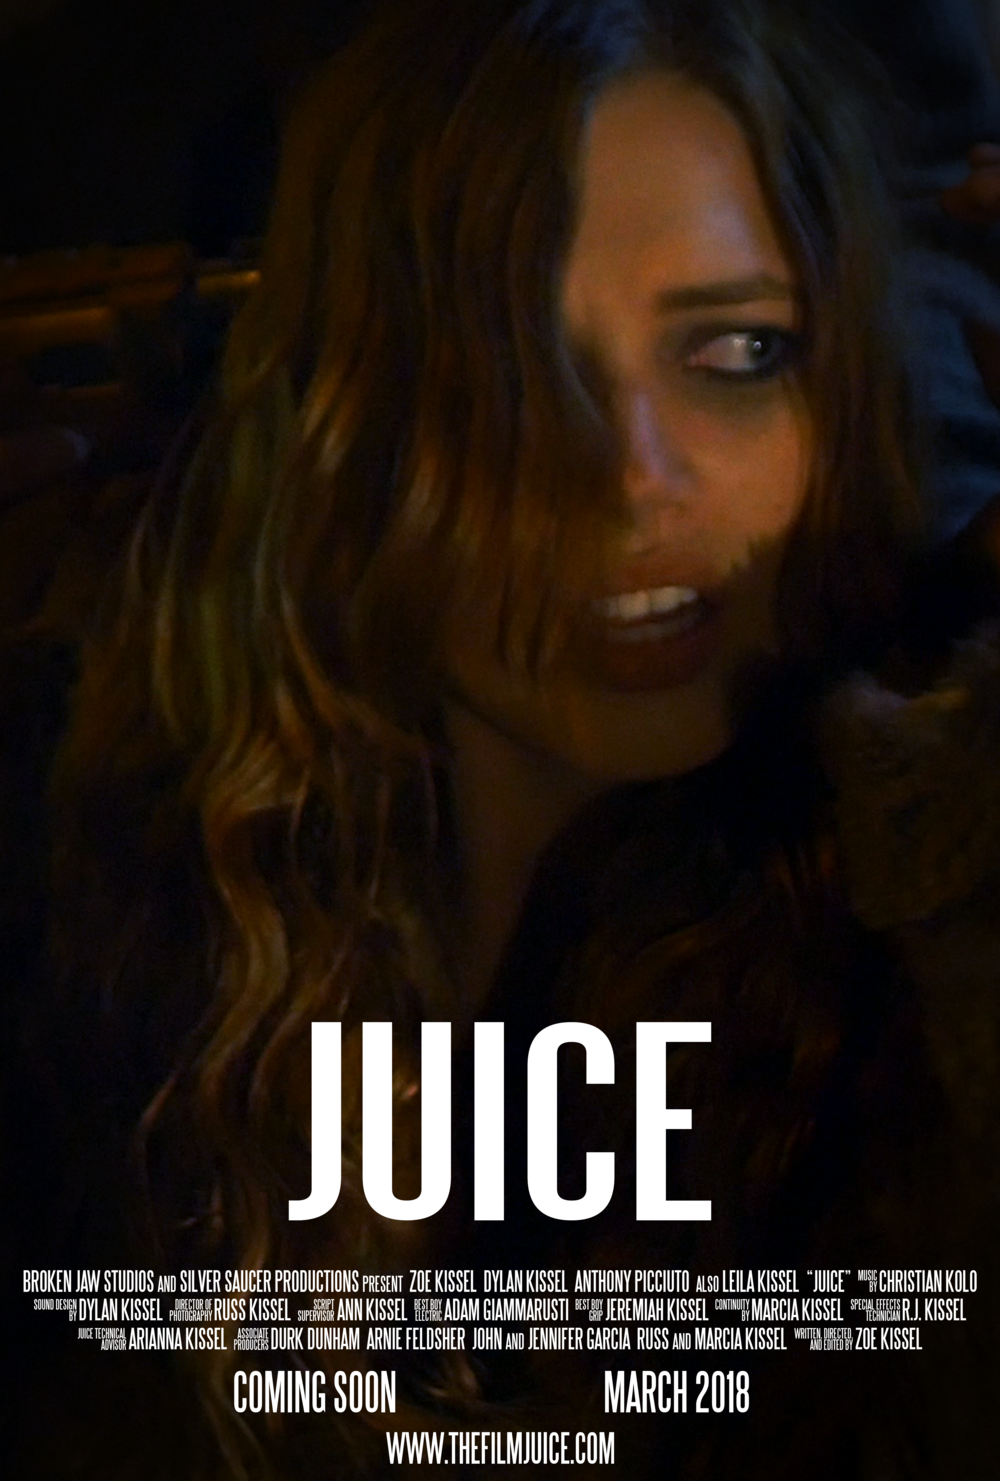 JuiceOfficialPoster_LOWRES.png